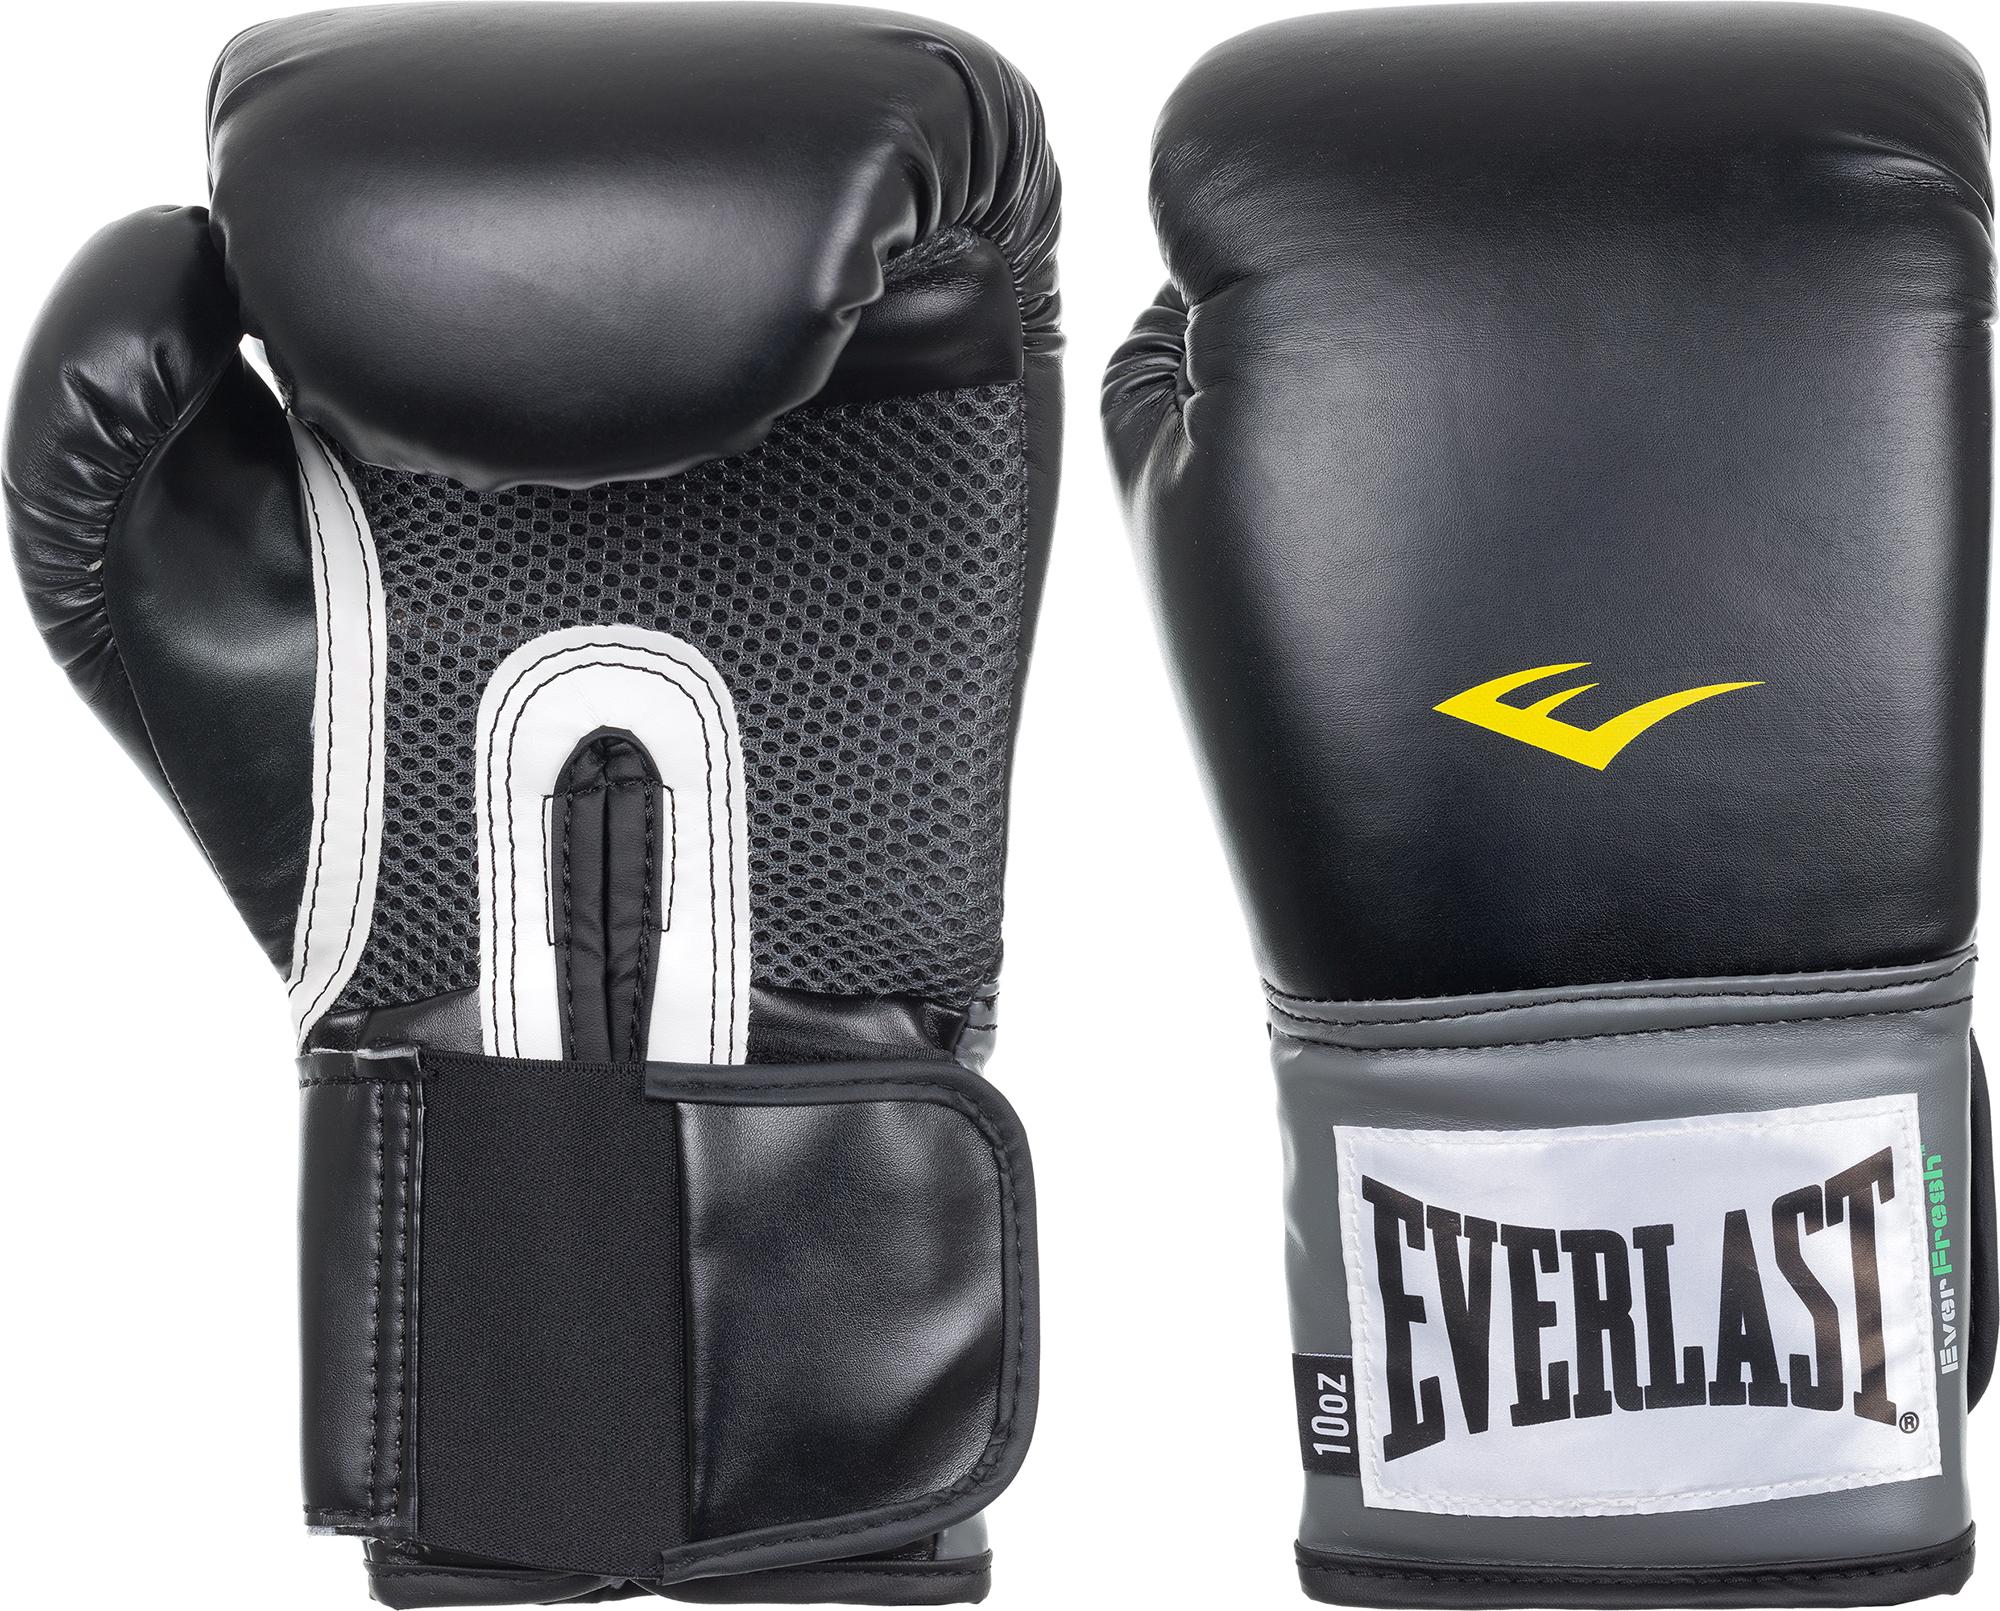 Everlast Перчатки тренировочные Everlast PU Pro Style, размер 14 oz часы сима ленд трактор 1031097